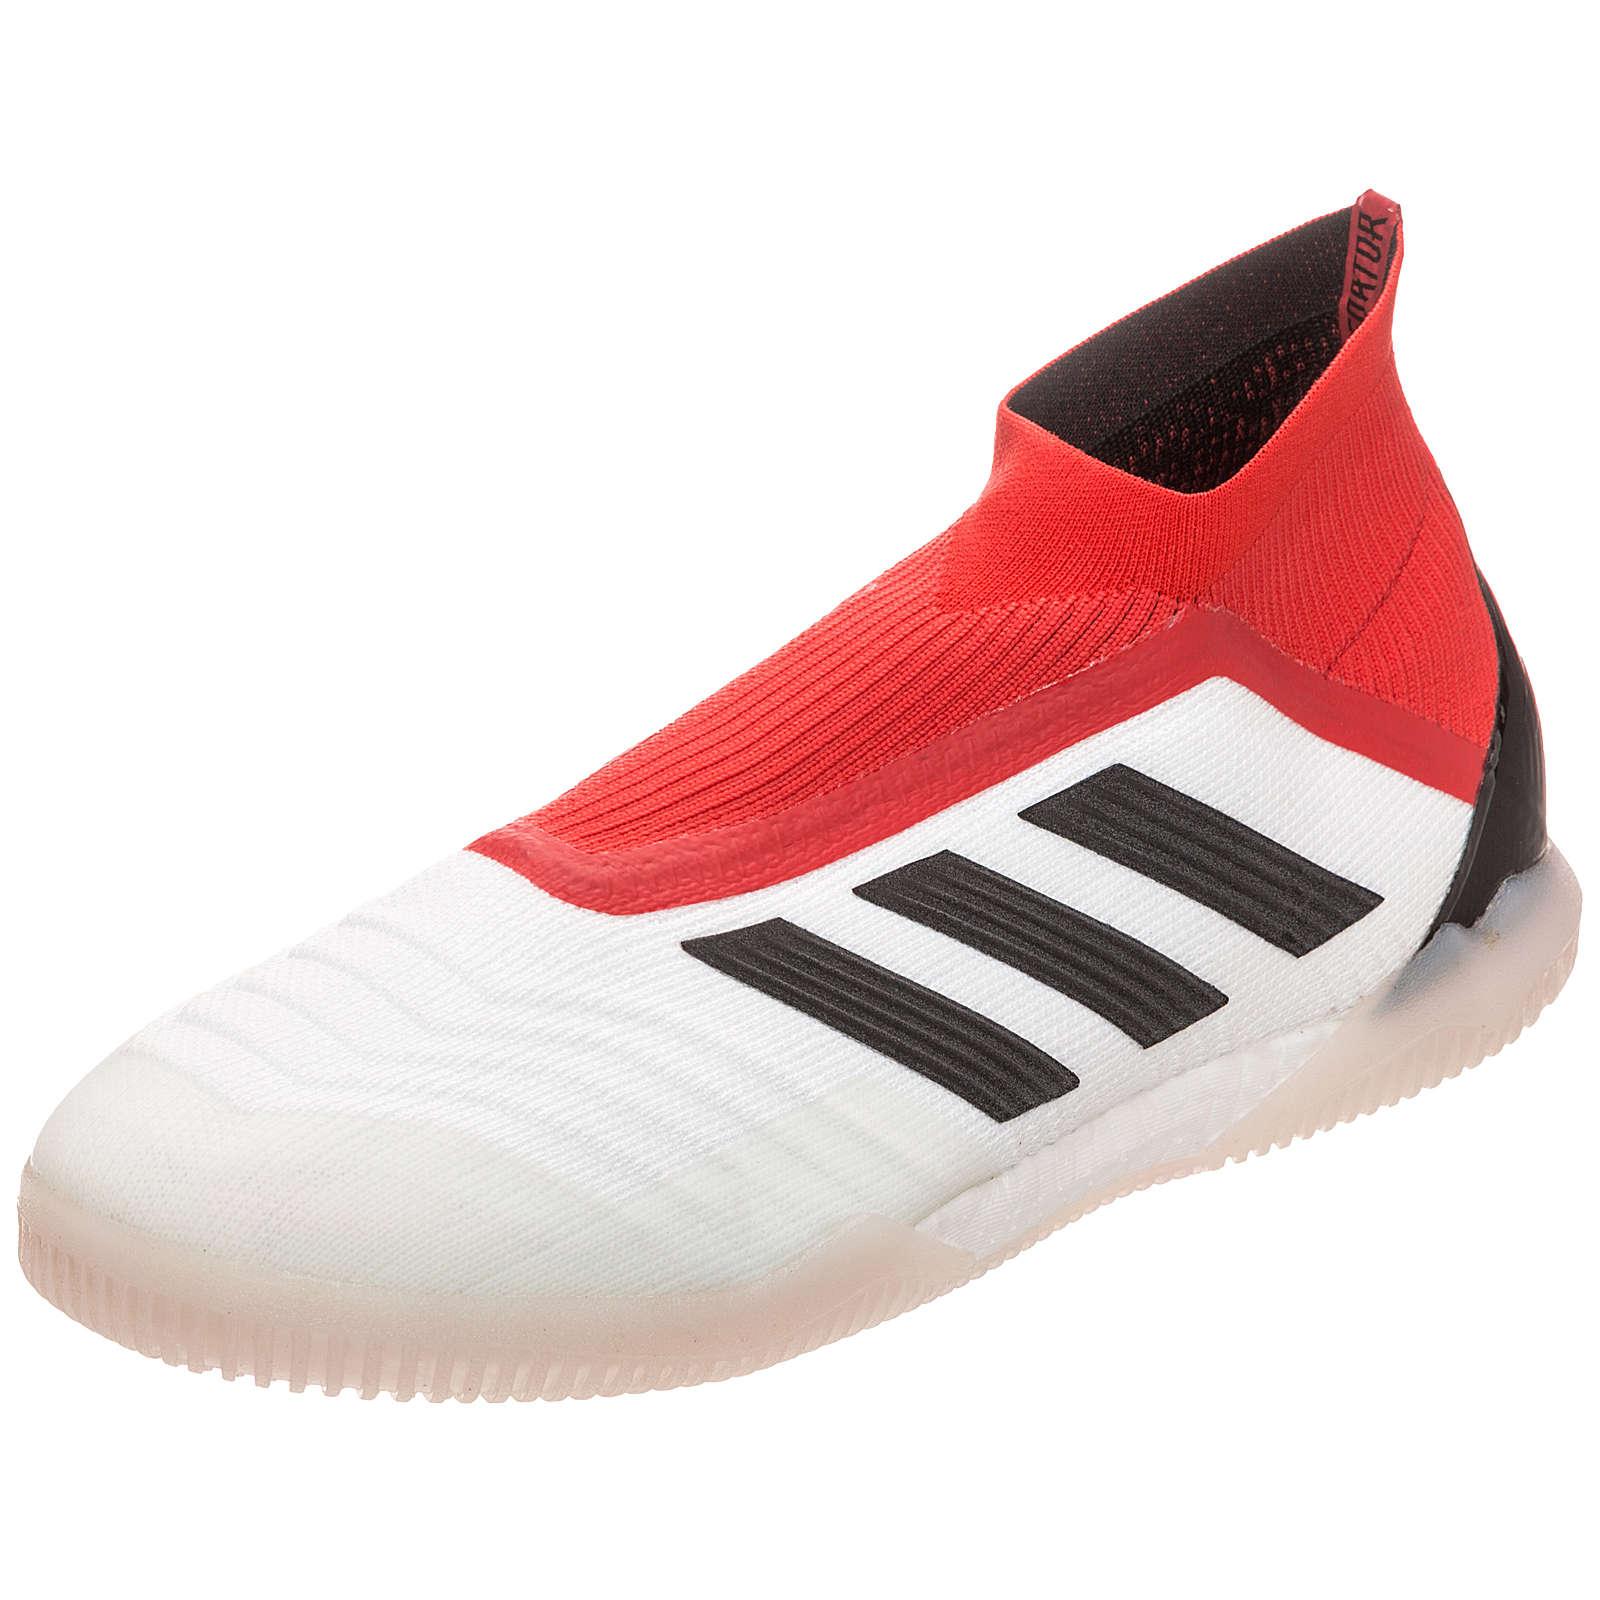 adidas Performance Predator Tango 18+ 360Control Indoor Fußballschuhe weiß-kombi Herren Gr. 43 1/3